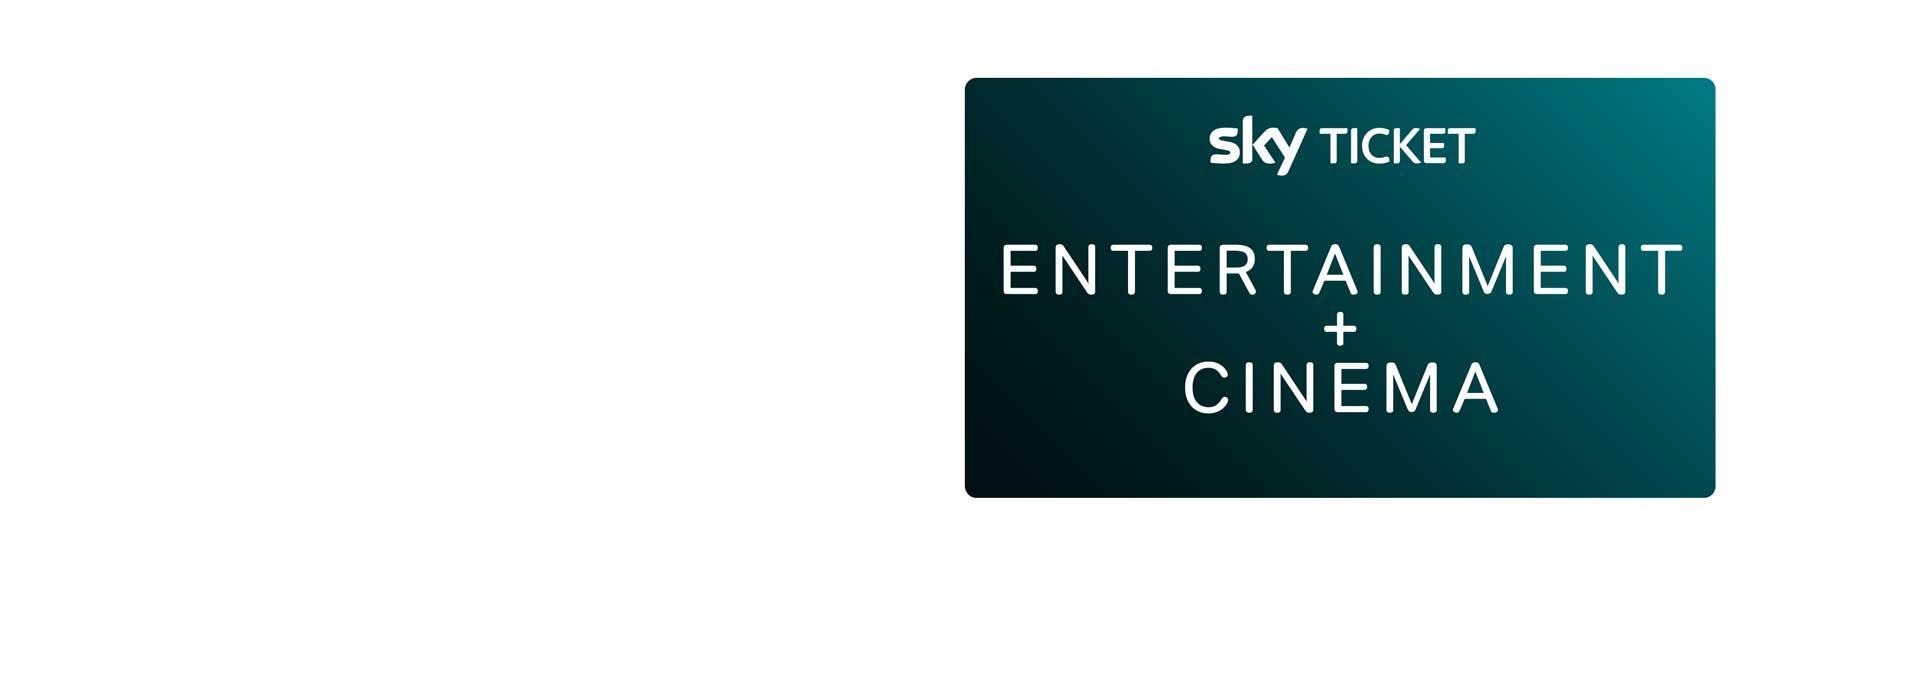 Sky Cinema Ticket